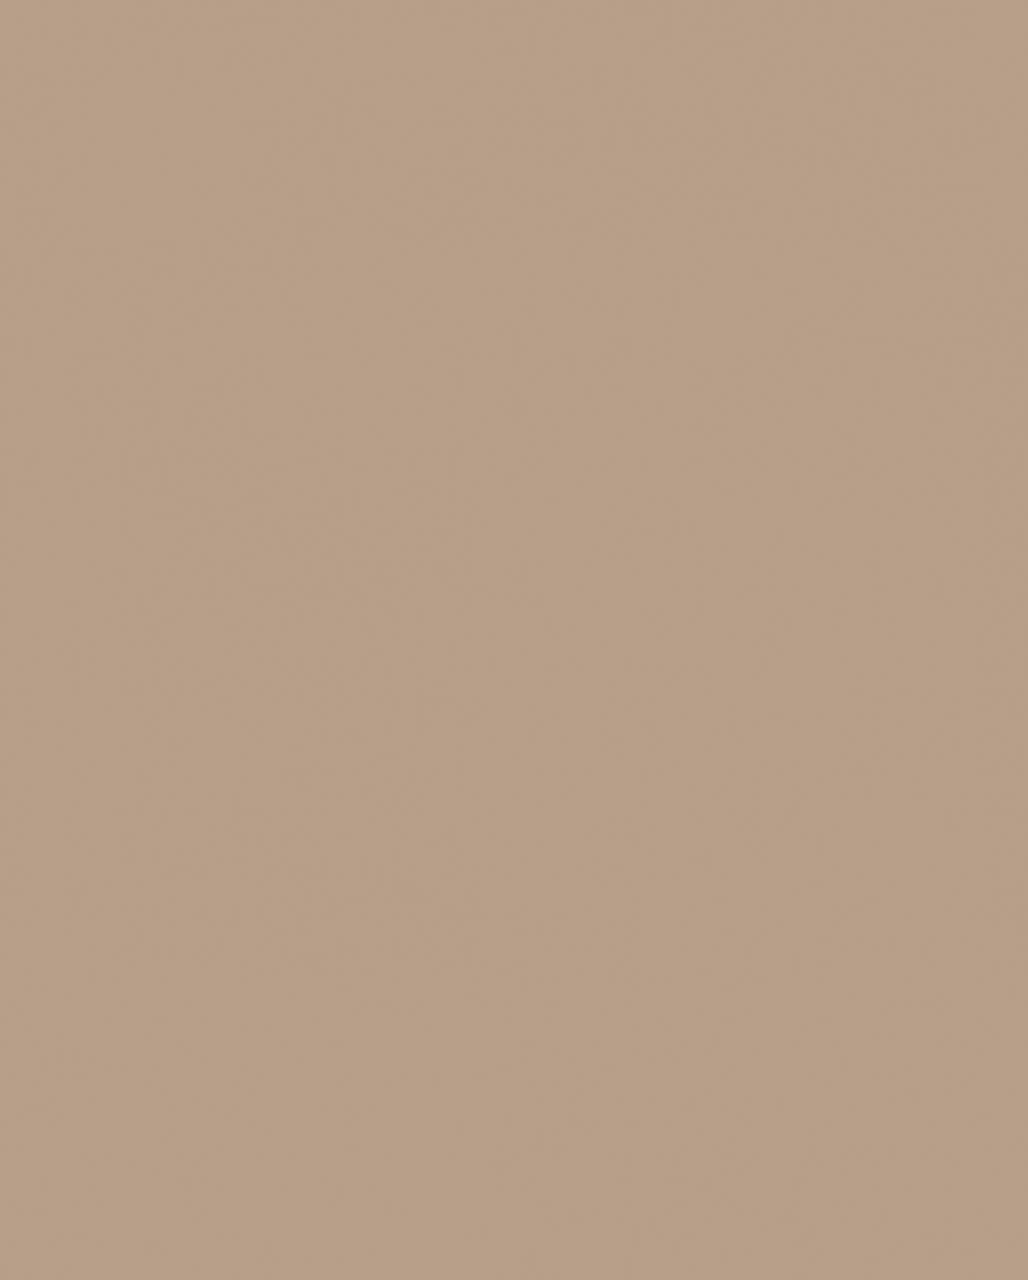 8533 Macchiato (MF PB sample)